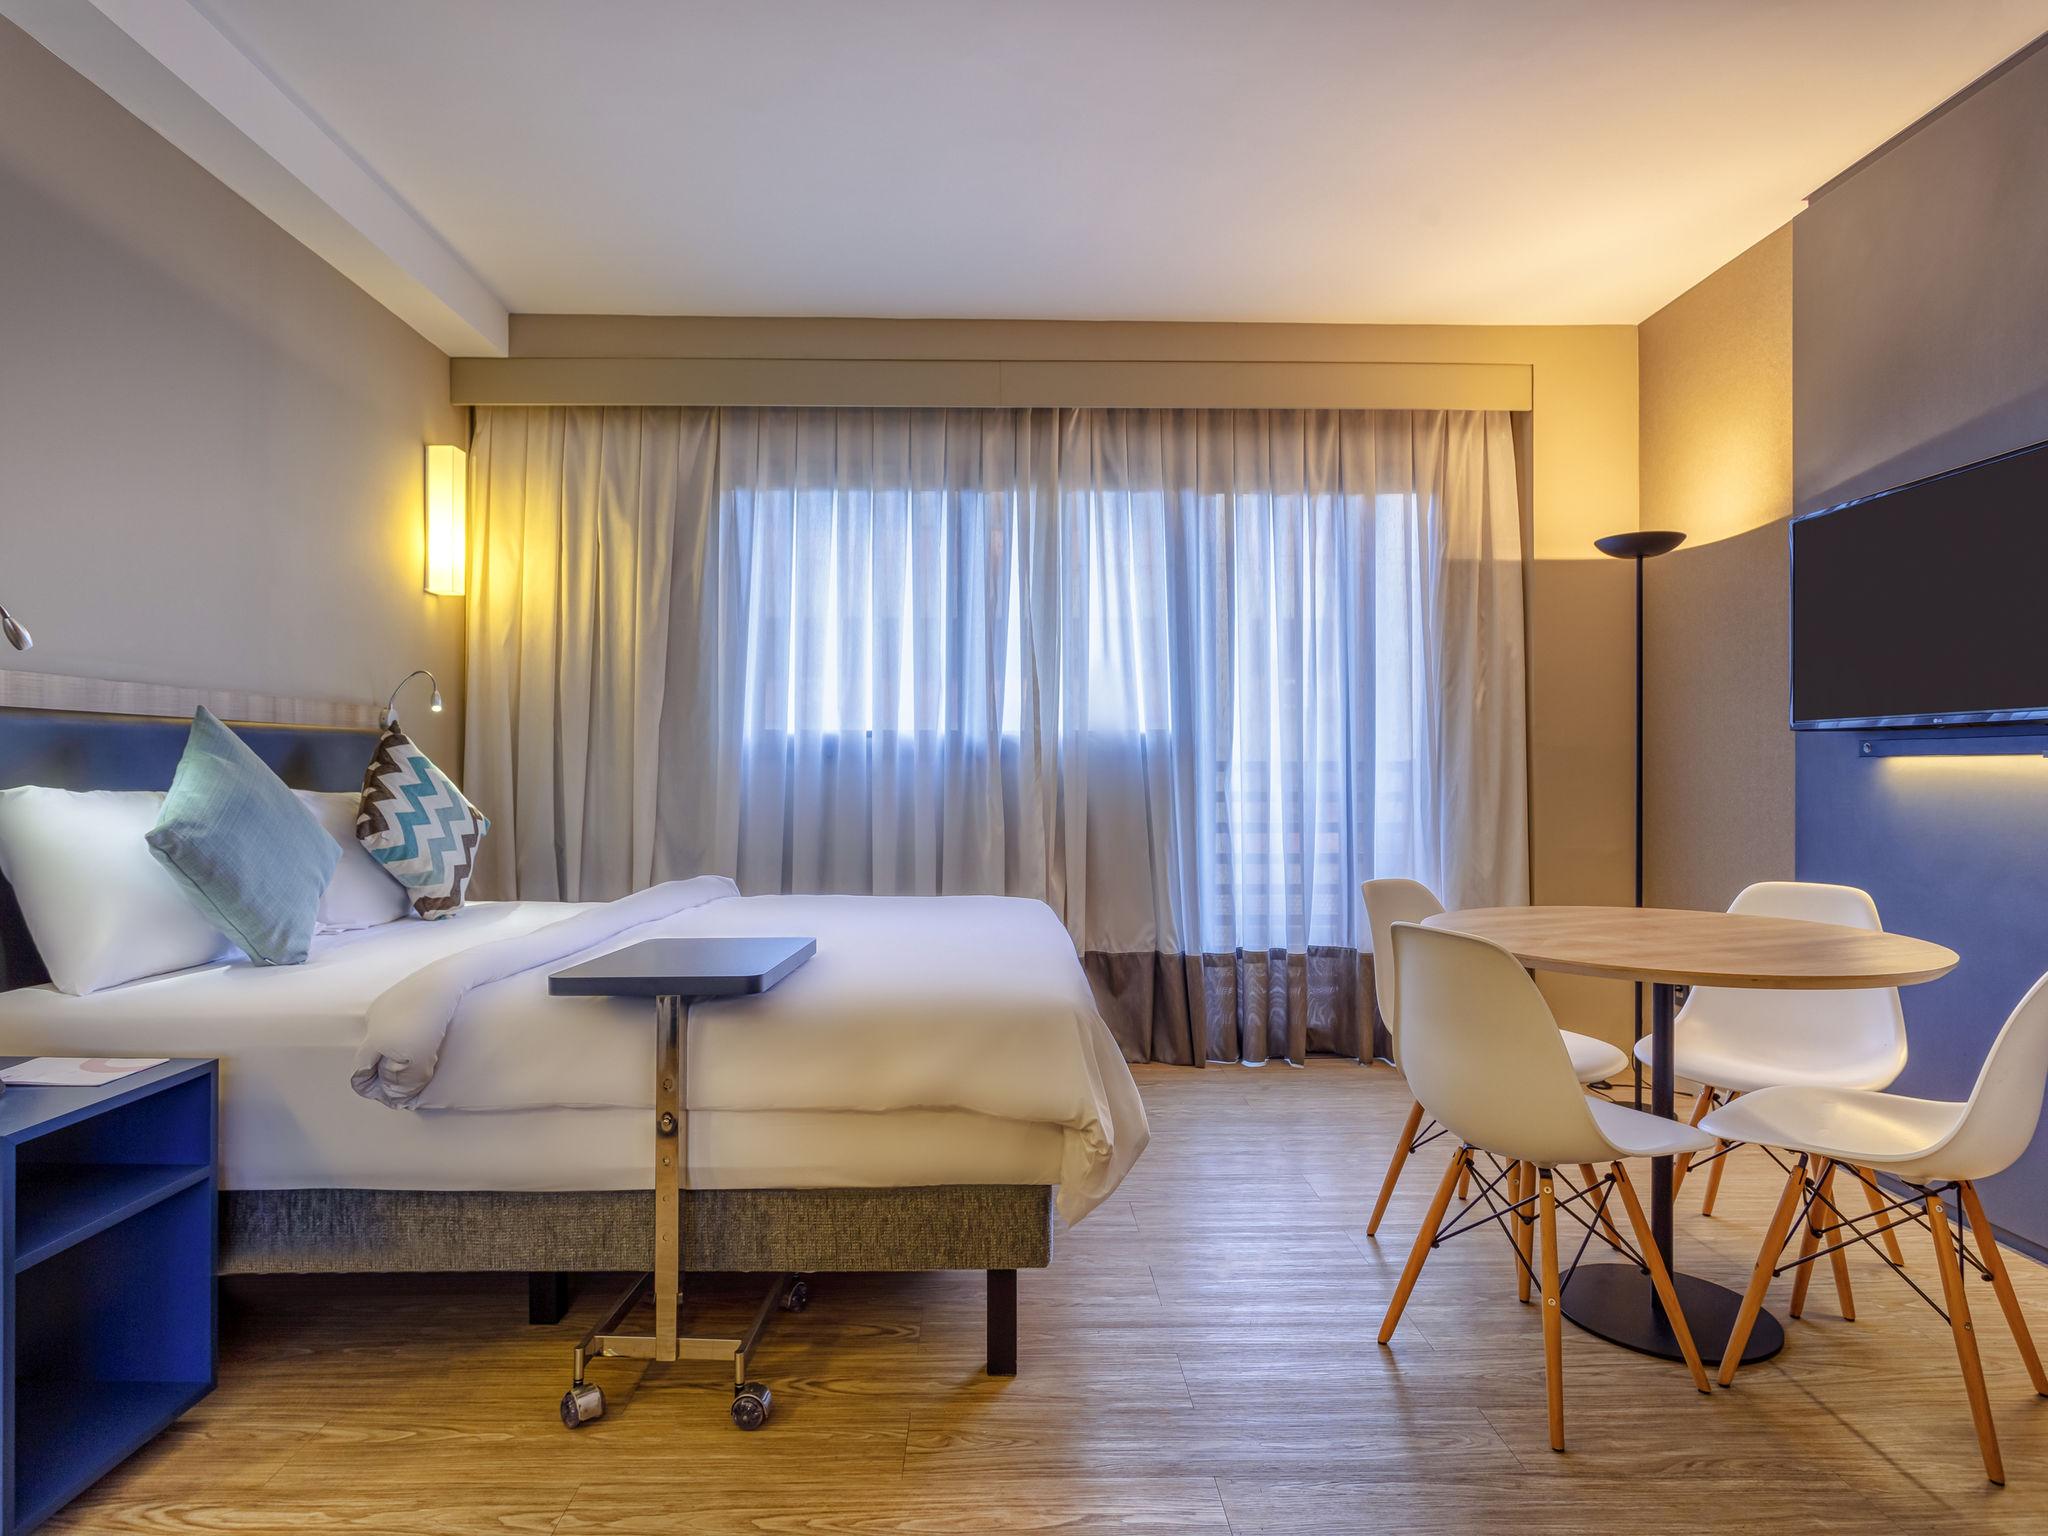 Hotel – Hotel de apartamentos Adagio Alphaville